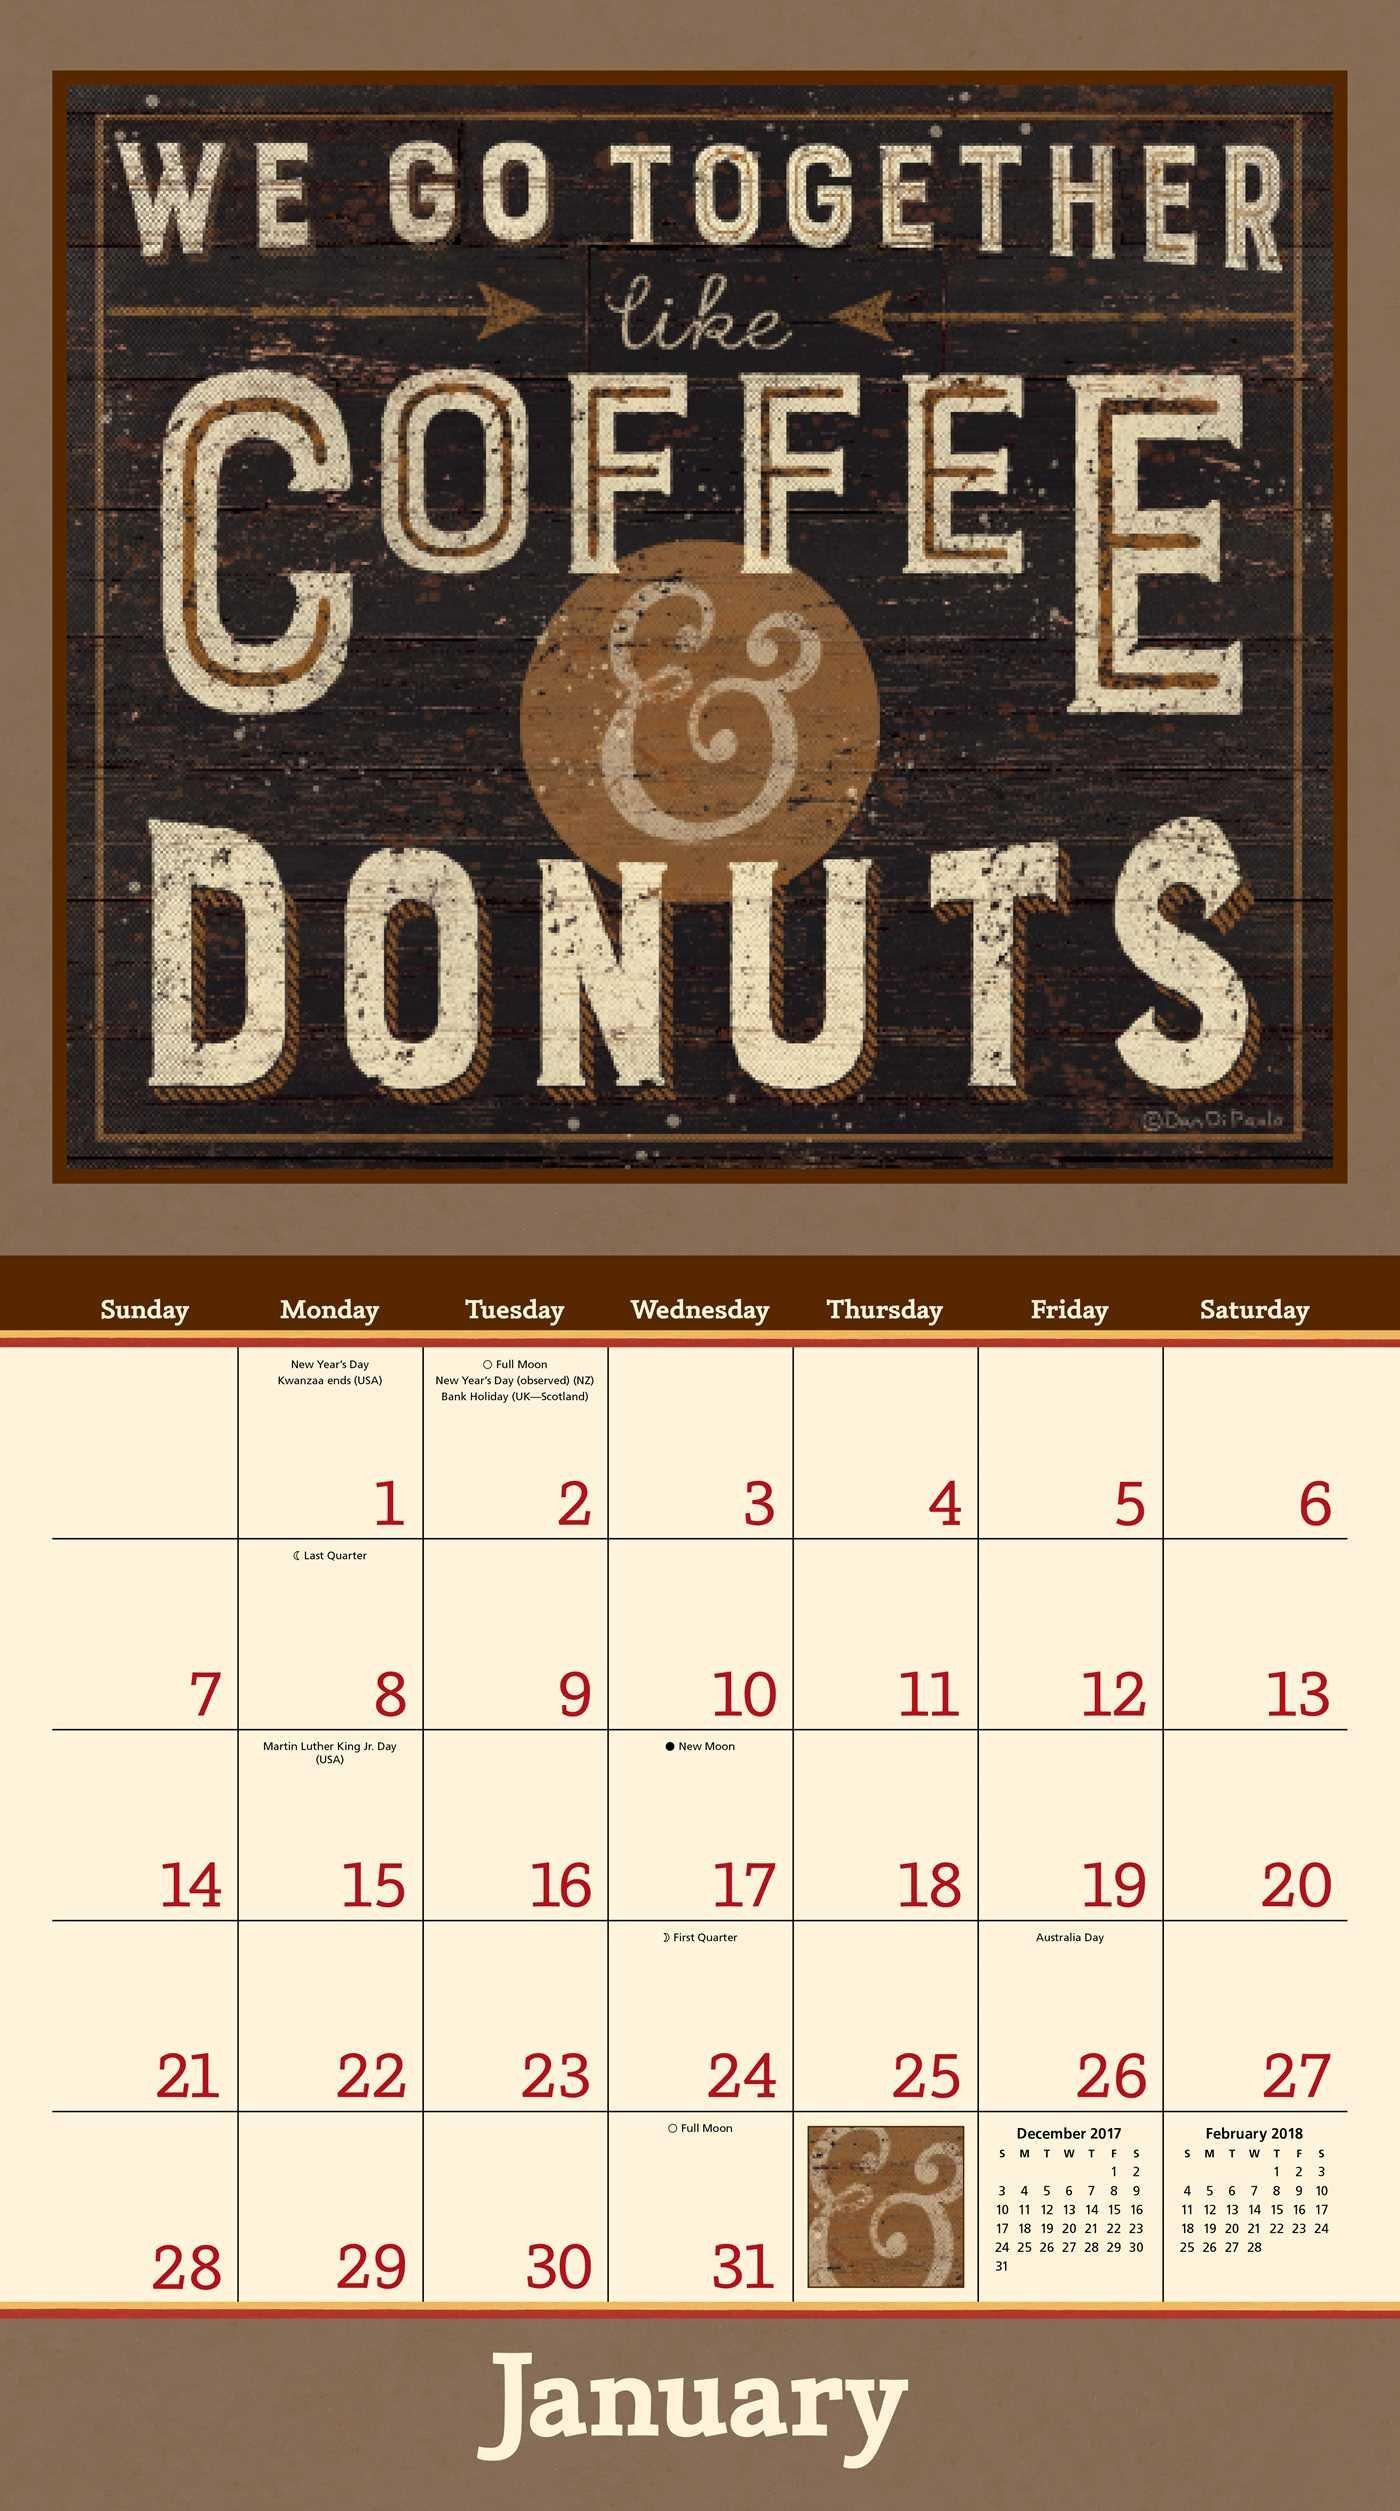 Coffee 2018 Deluxe Wall Calendar: Dan DiPaolo: 9781449482381: Amazon.com:  Books